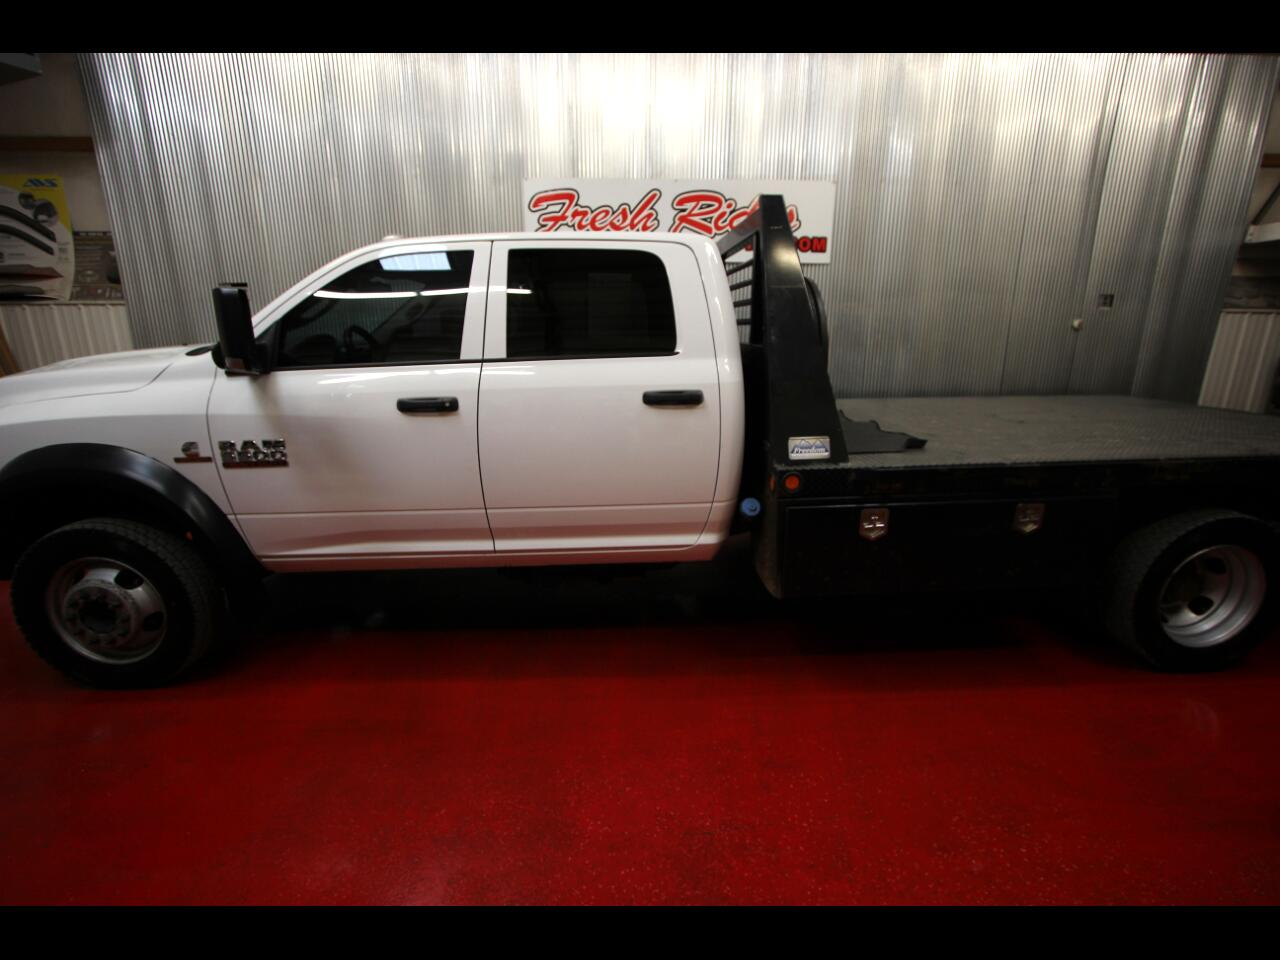 2014 RAM 5500 Chassis Cab Tradesman 4x4 Crew Cab 84